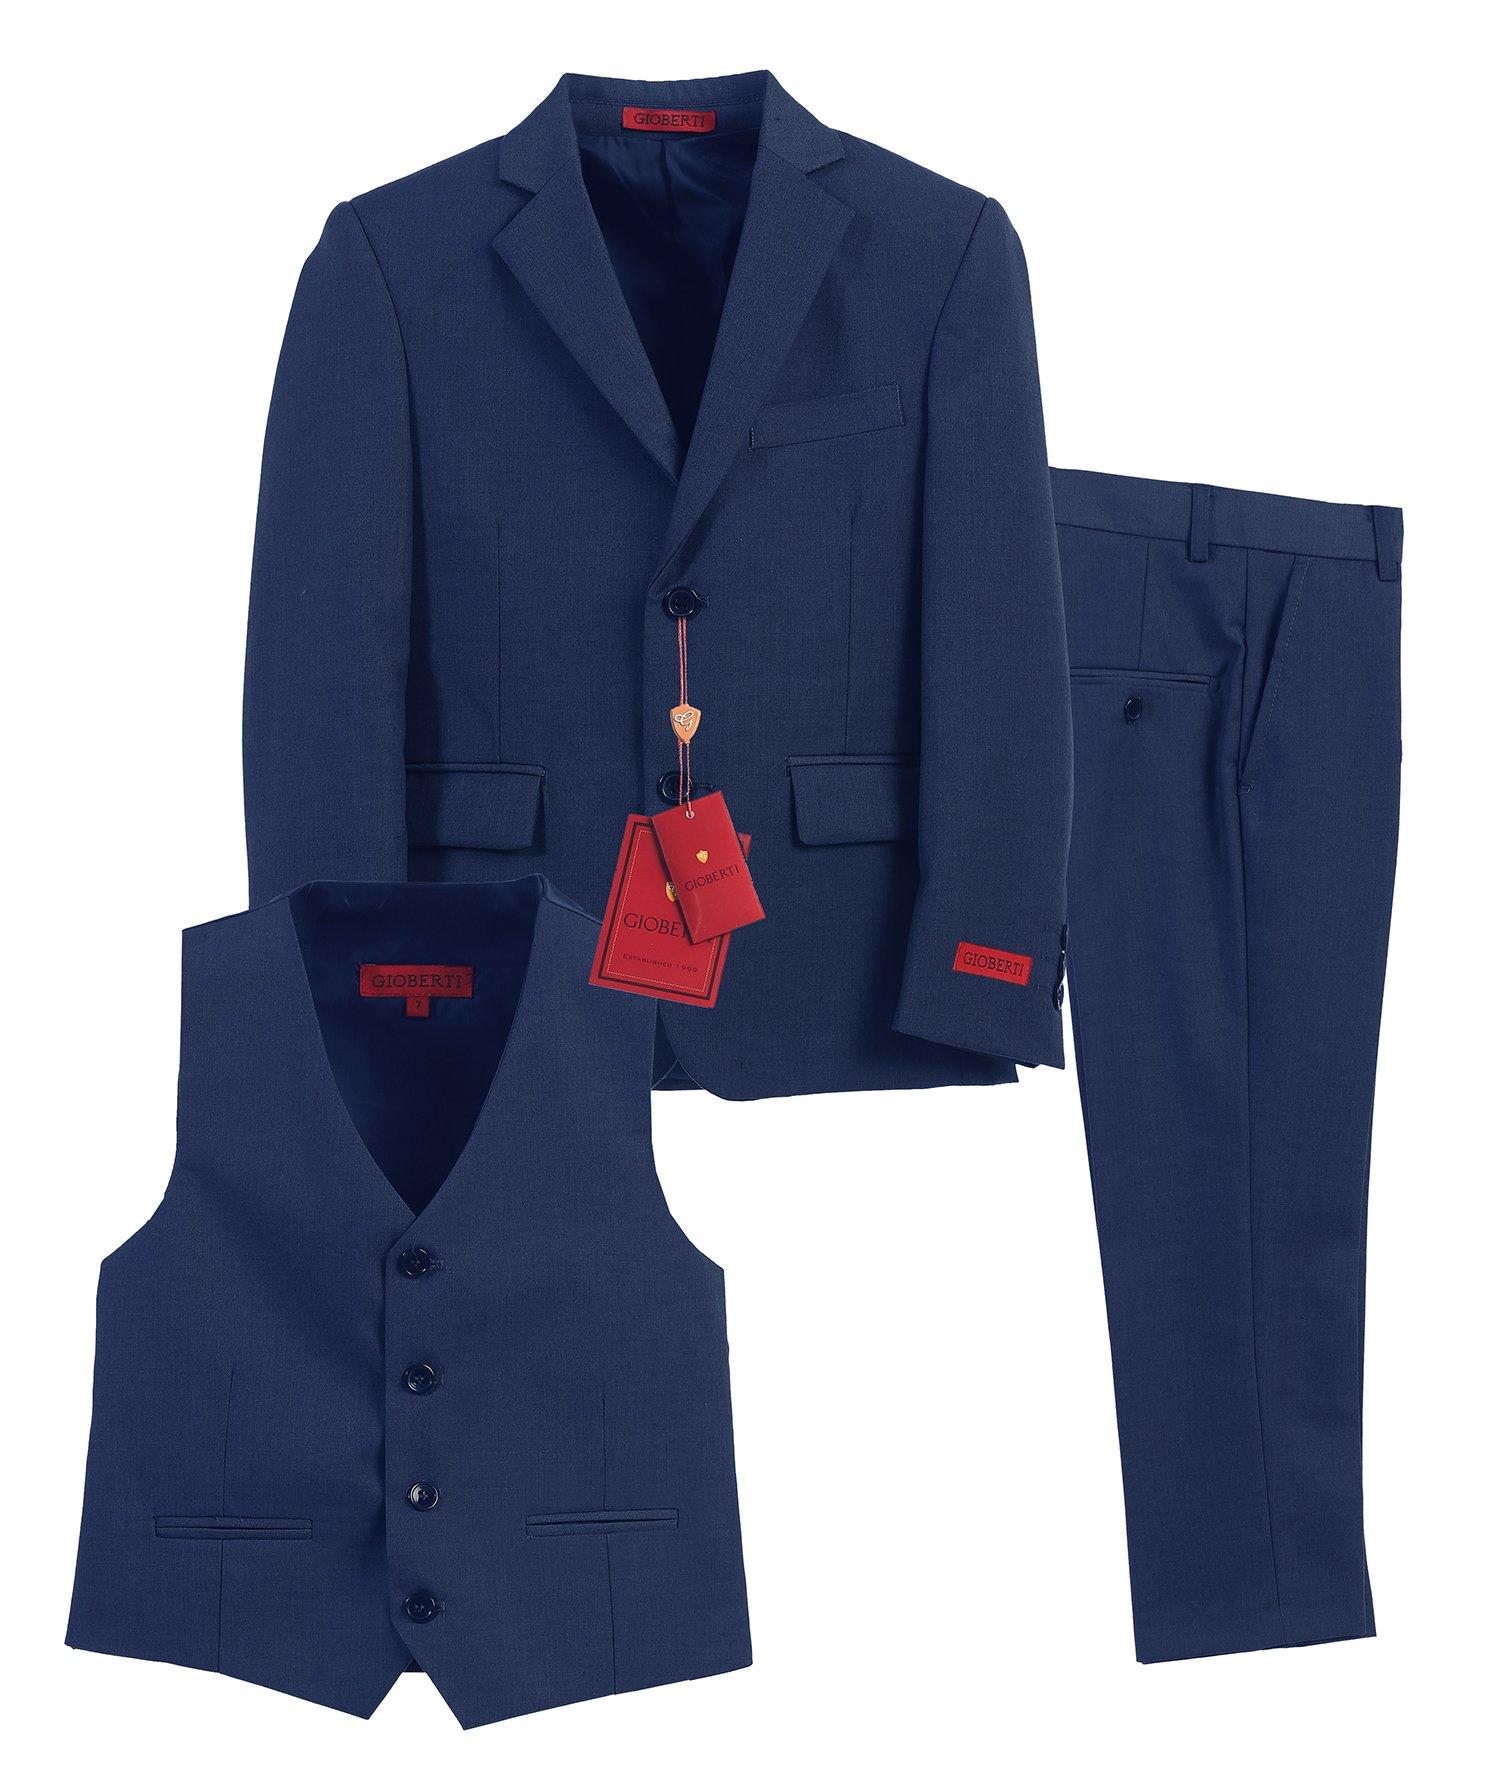 Gioberti Boy's Formal 3 Piece Suit Set, Royal Blue, Size 14